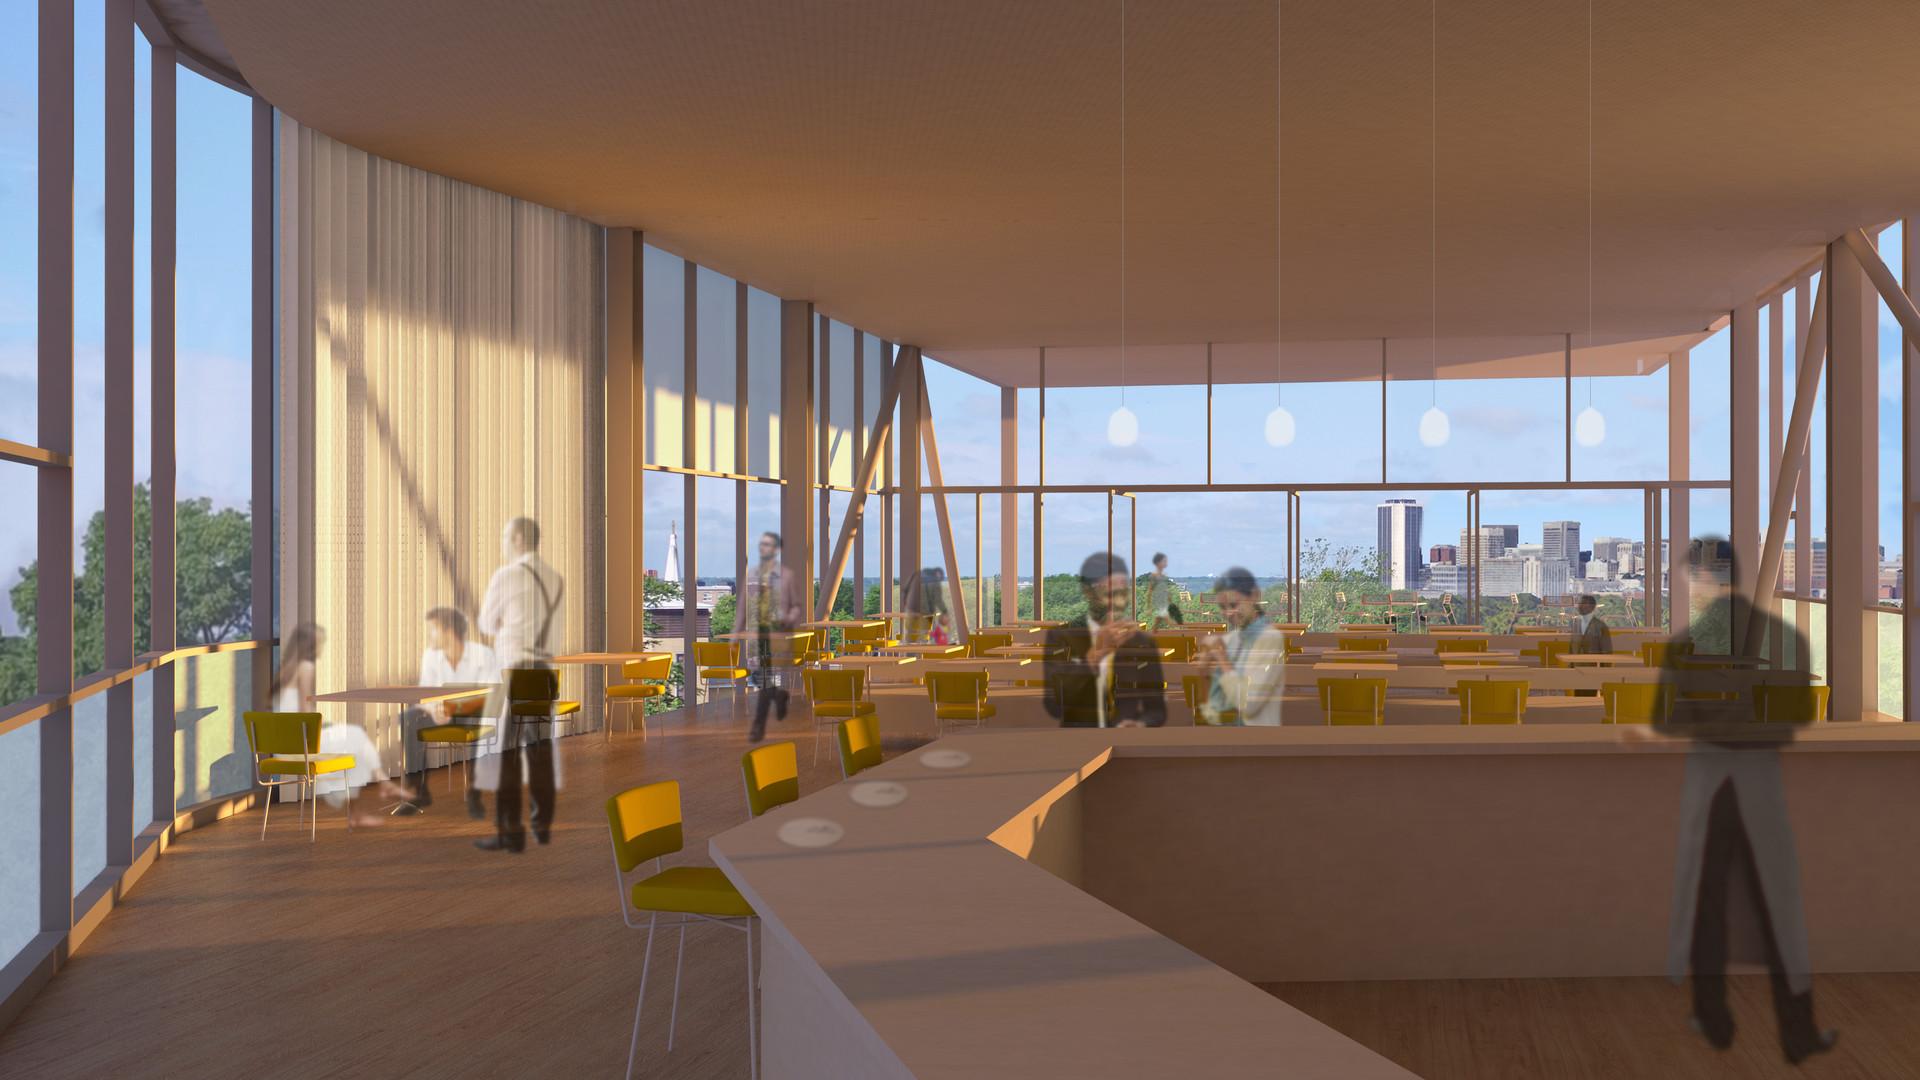 Public restaurant will have views over Richmond